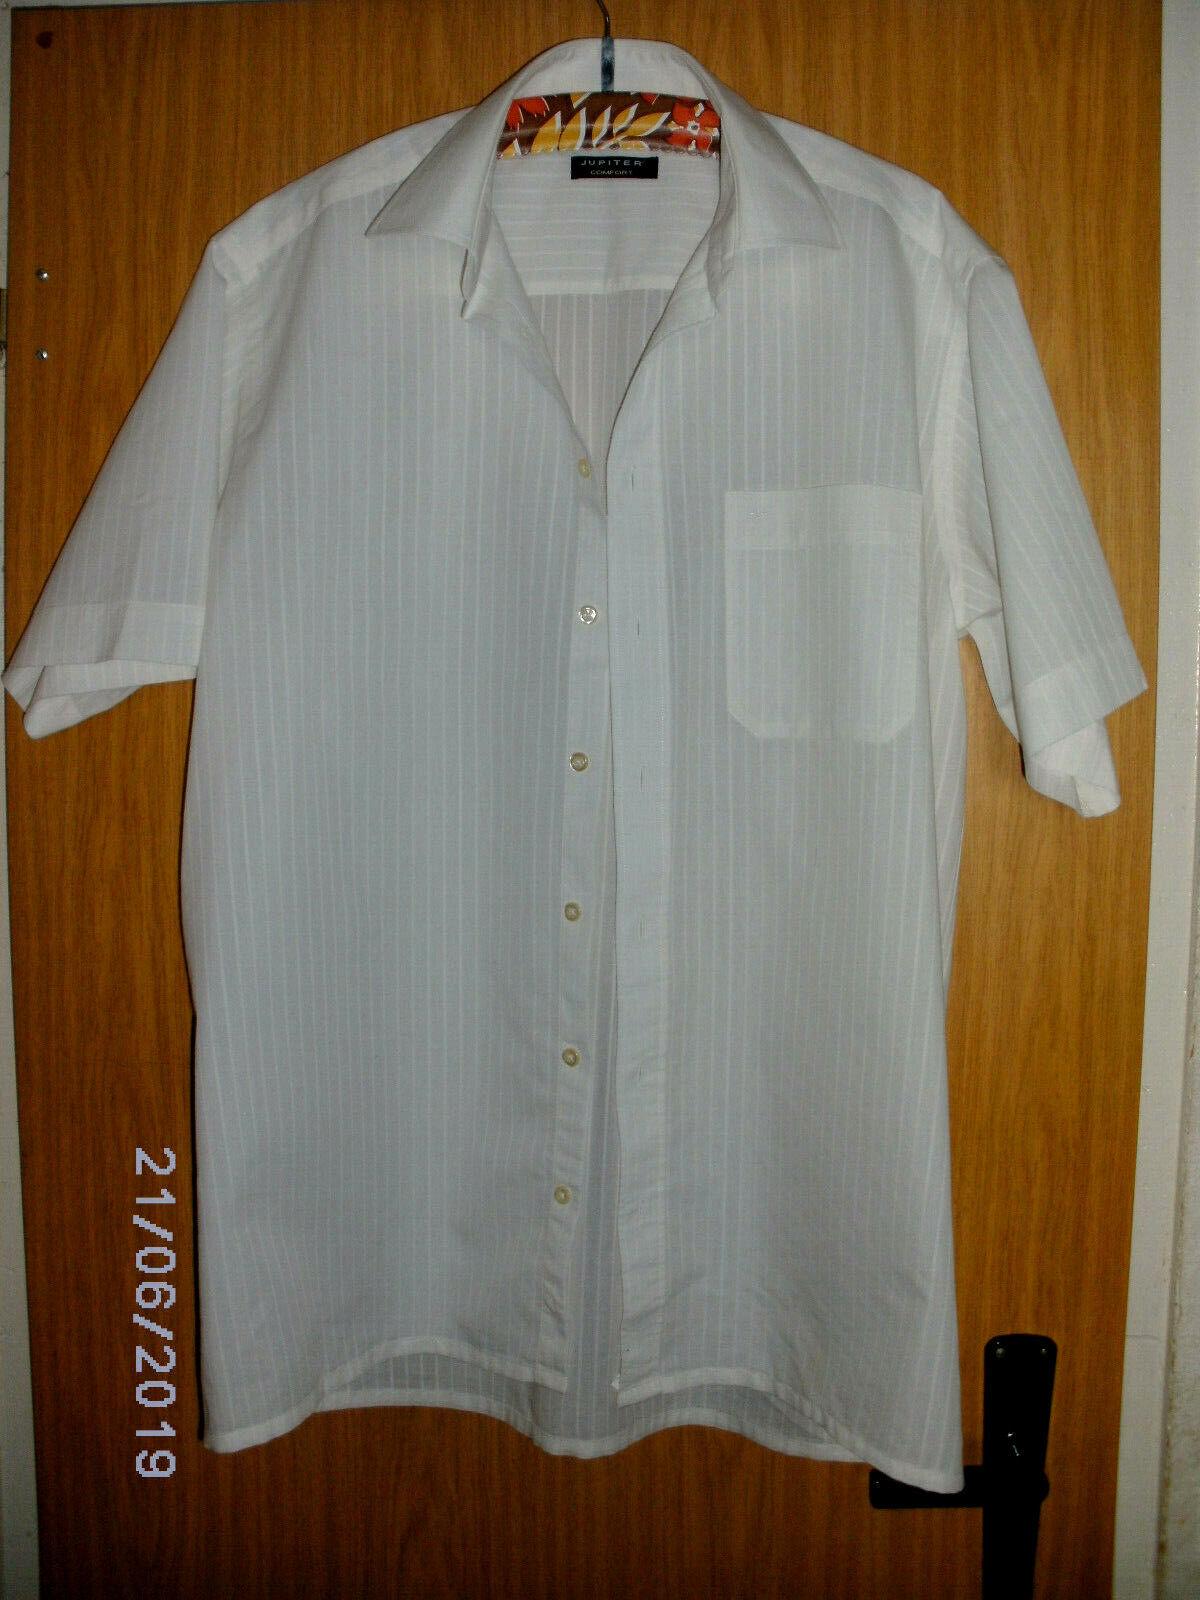 new product 85999 6b8c9 Herrenhemd Cremefarben Vergleich Test +++ Herrenhemd ...